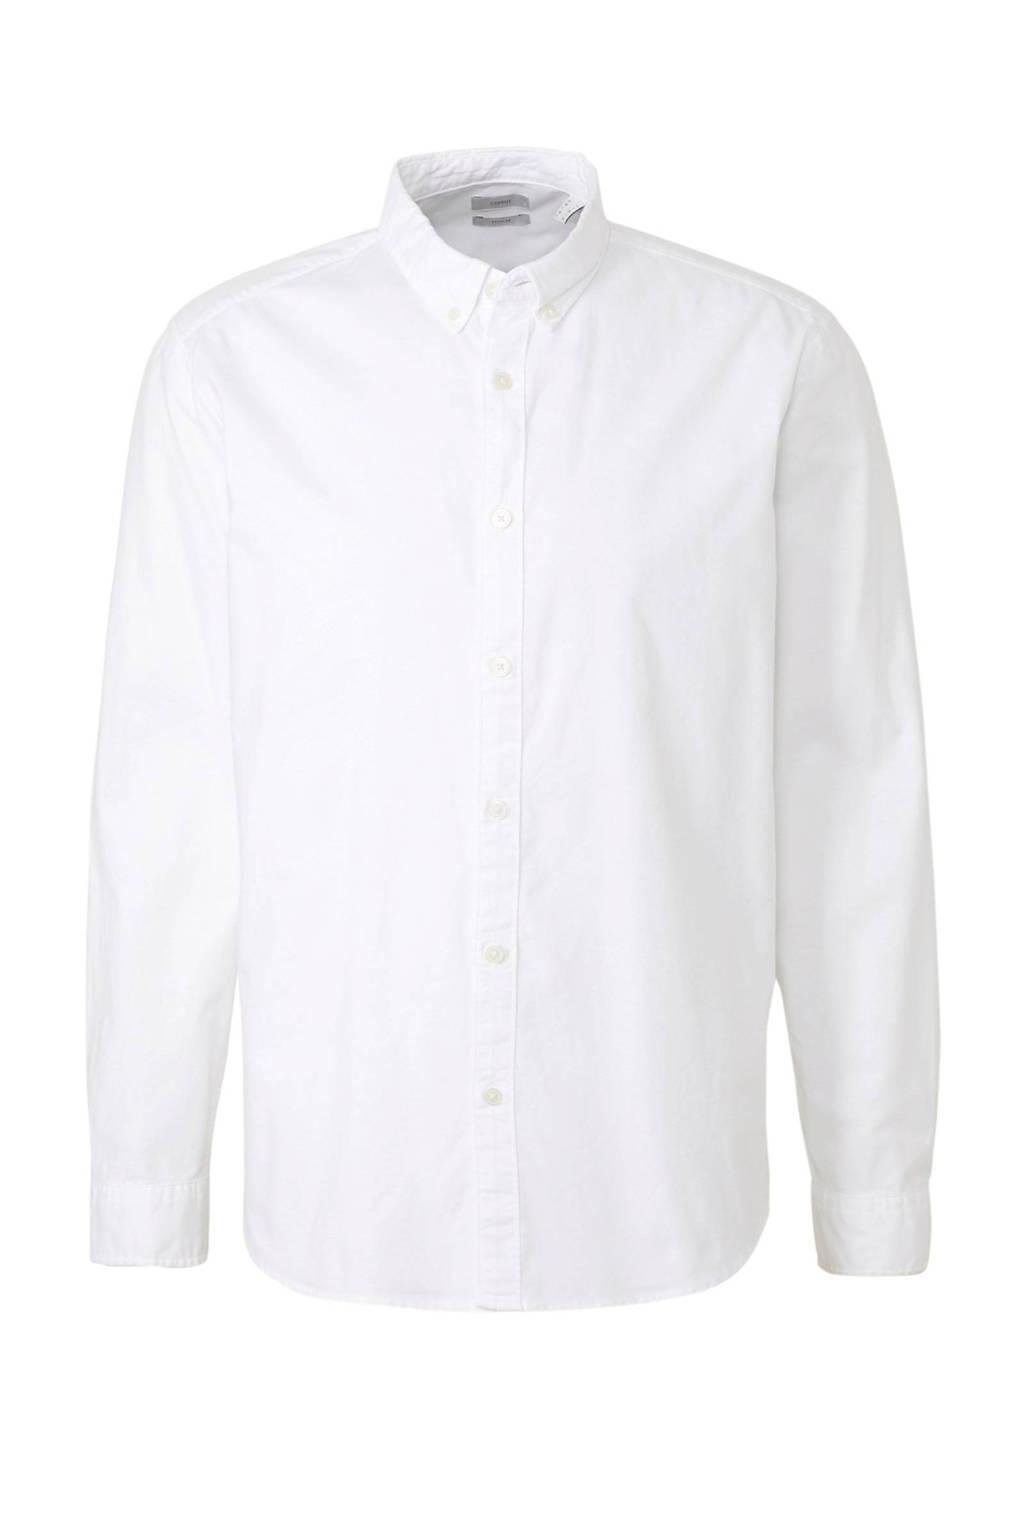 ESPRIT Men Casual slim fit overhemd wit, Wit